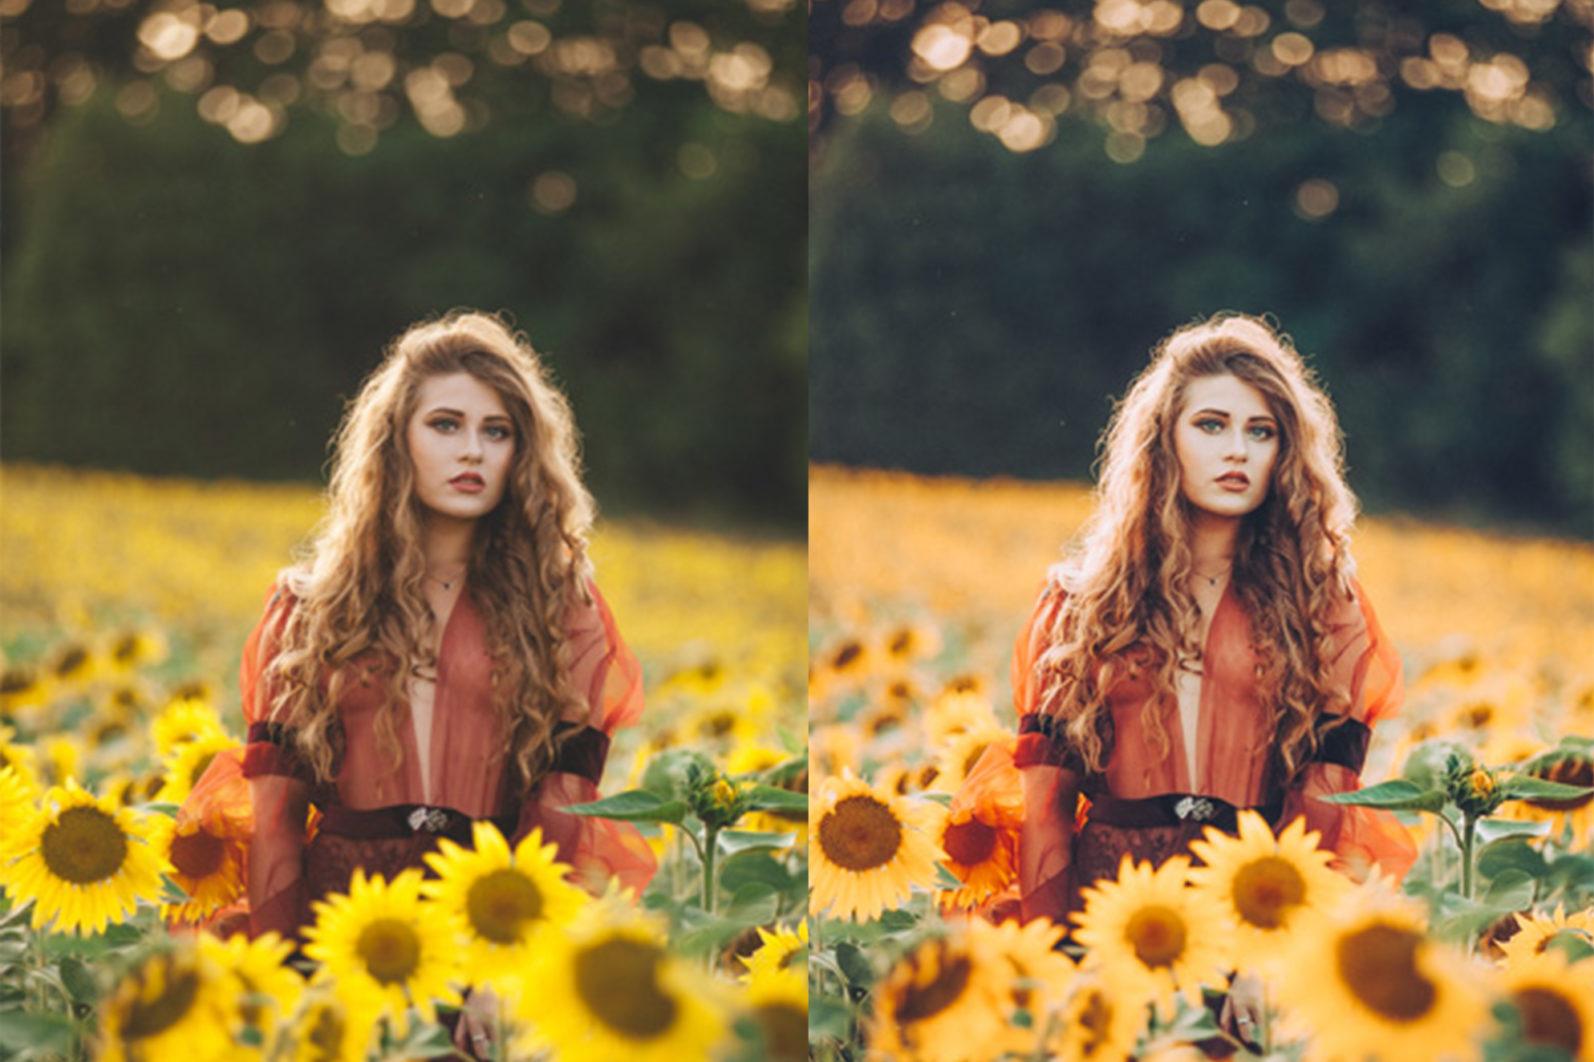 12 x Sunflower Fields Lightroom Presets   Warm Lightroom Presets   Yellow Presets - 12 Sunflower Fields -